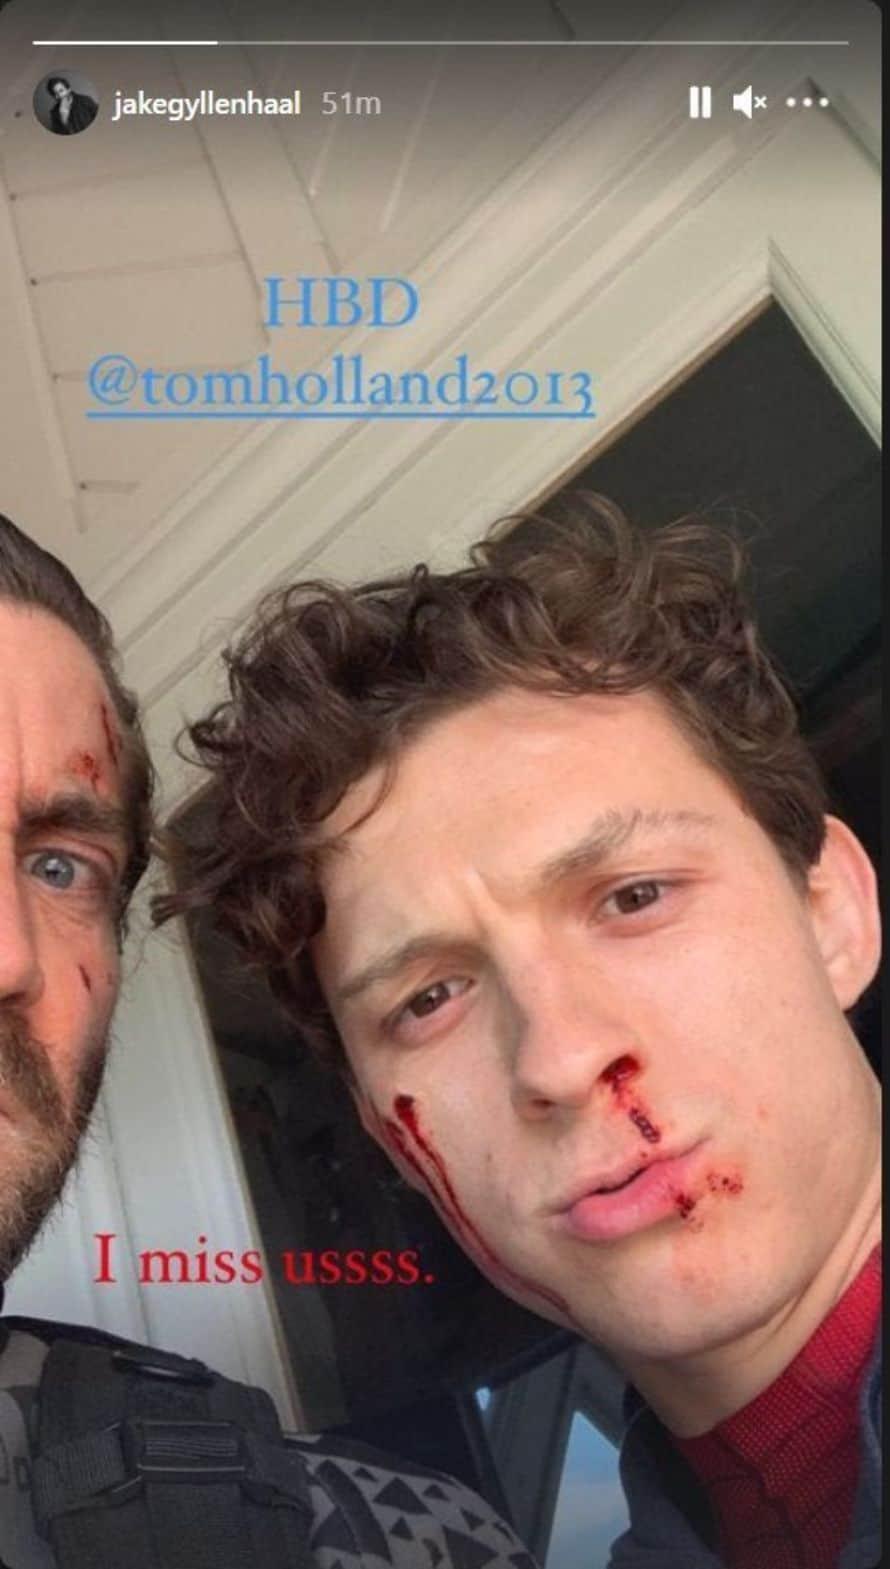 Jake Gyllenhaal Tom Holland Spider-Man